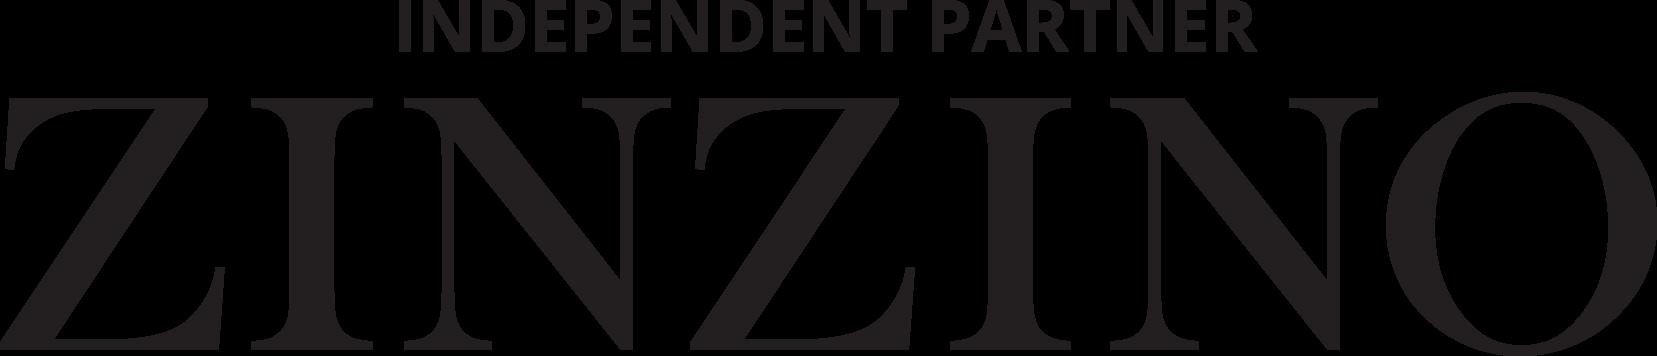 zinzino flexity partner-2